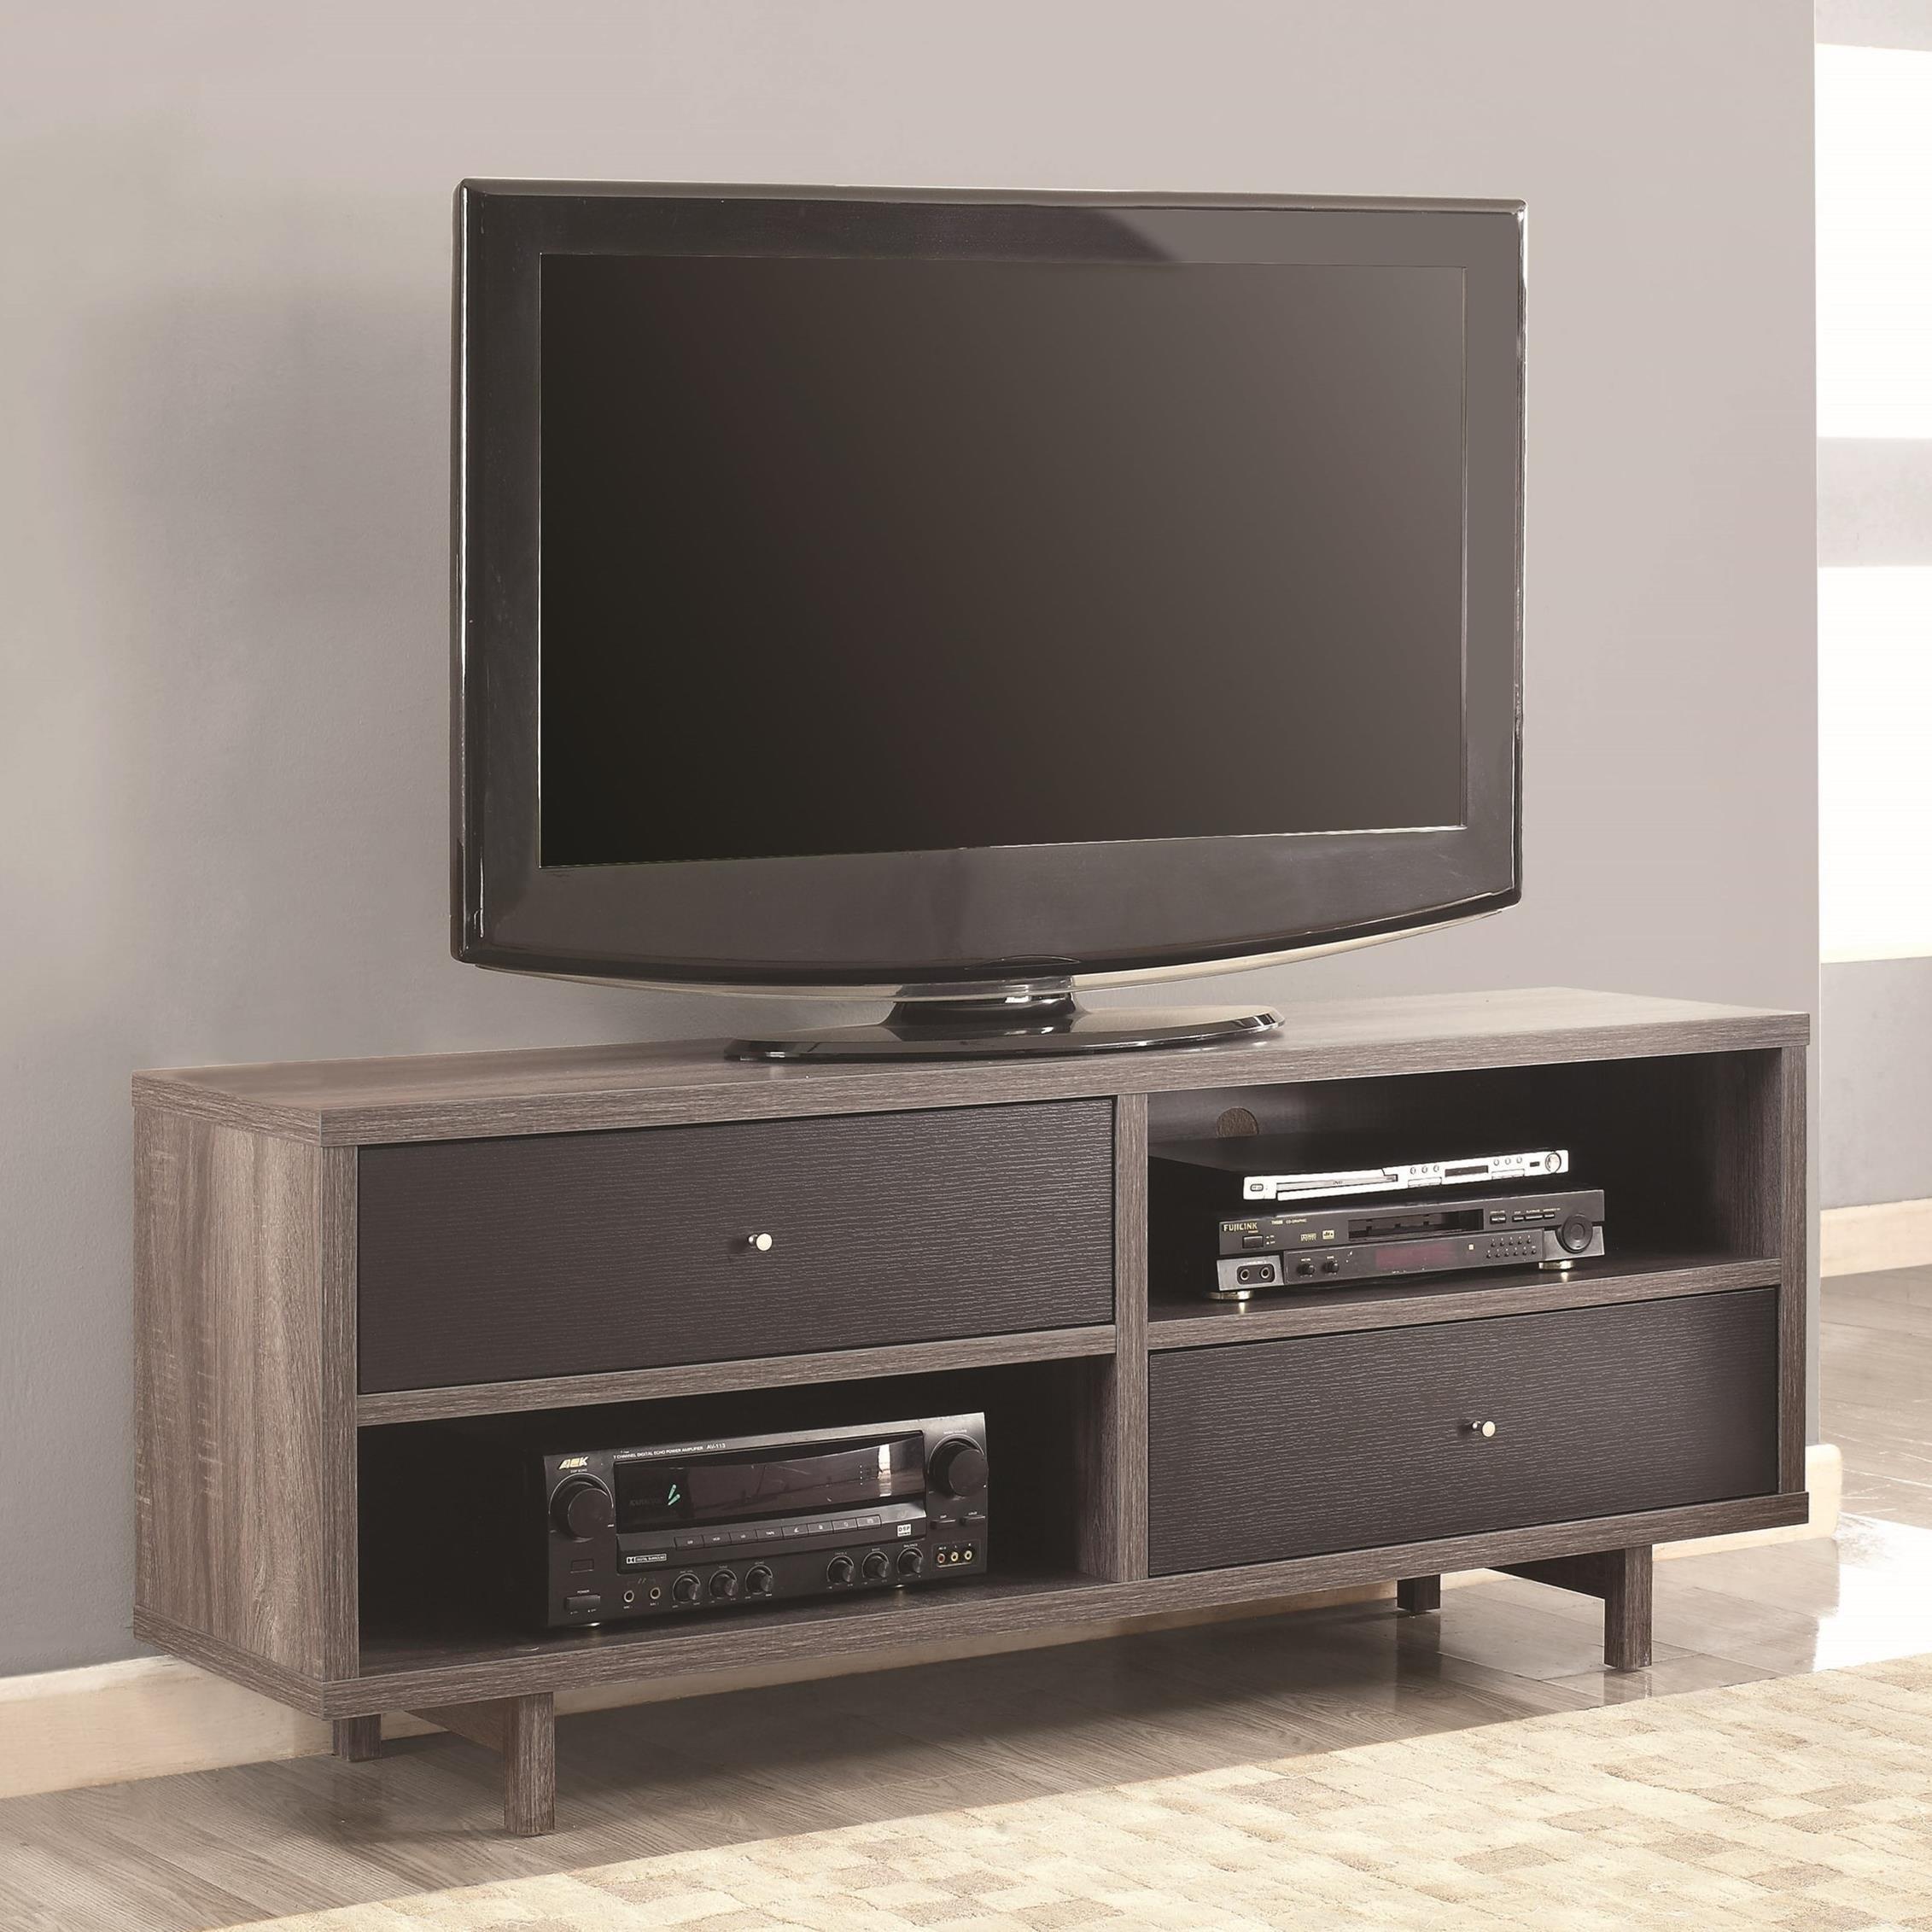 Coaster Entertainment Units TV Console   Item Number: 700795